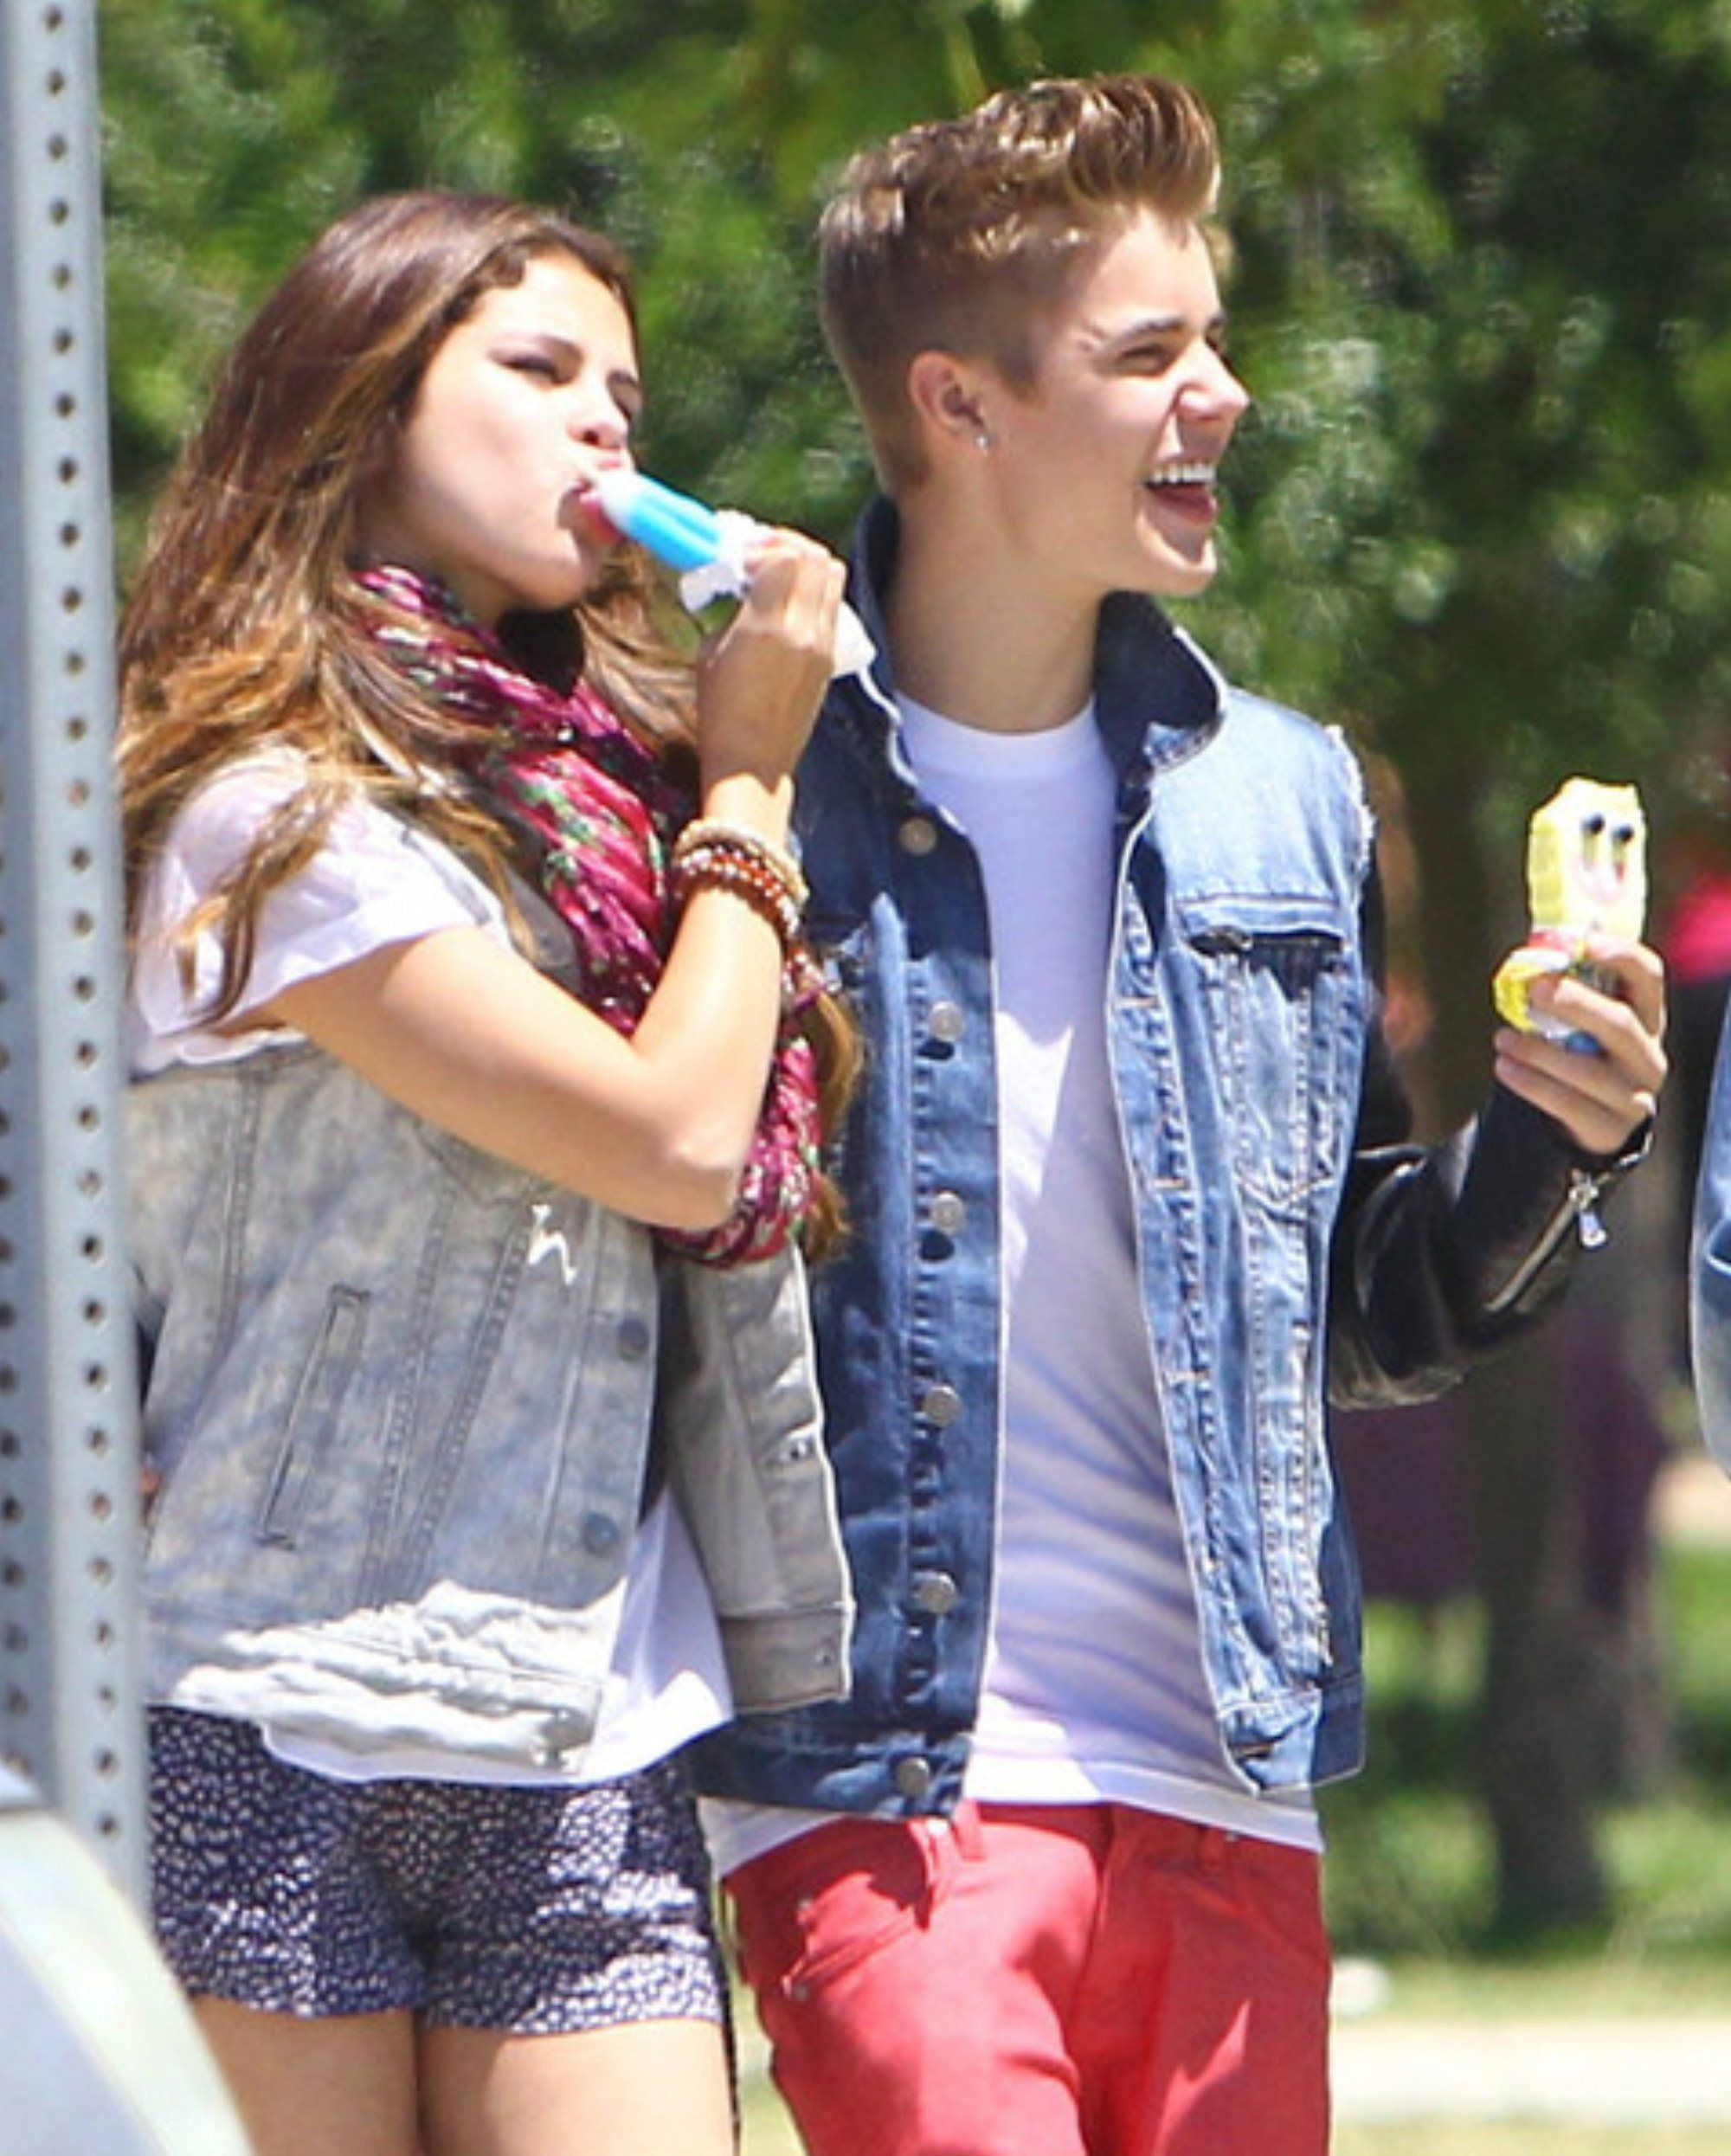 Justin Bieber Photo Justin Bieber Selena Gomez 30 June 2012 Justin Bieber Selena Gomez Justin Bieber And Selena Cute Celebrity Couples